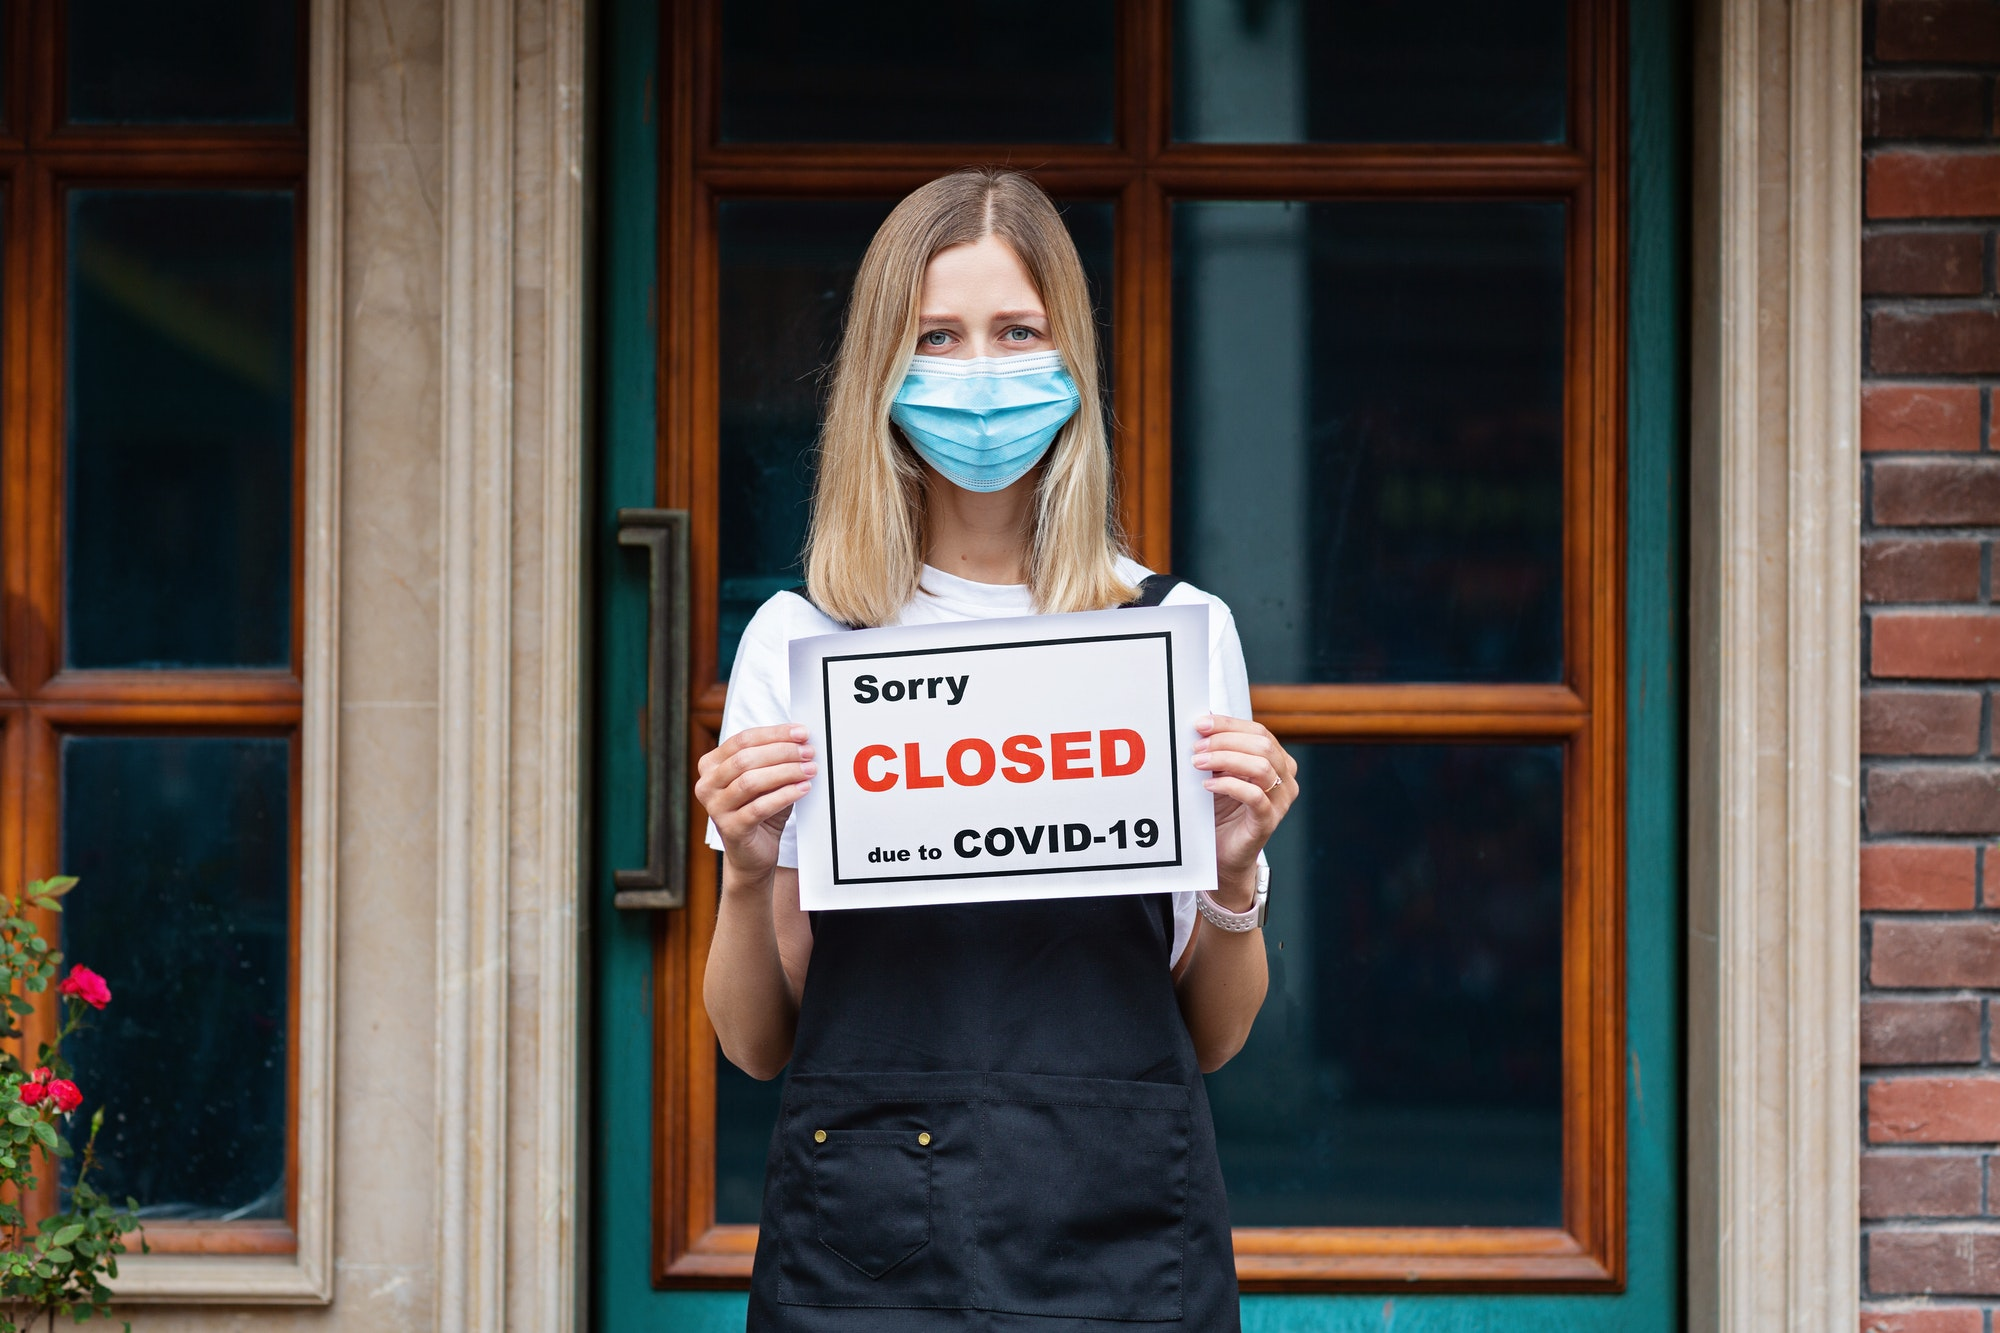 Restaurant owner holding note sorry closed due to covid19. Shutdown coronavirus quarantine